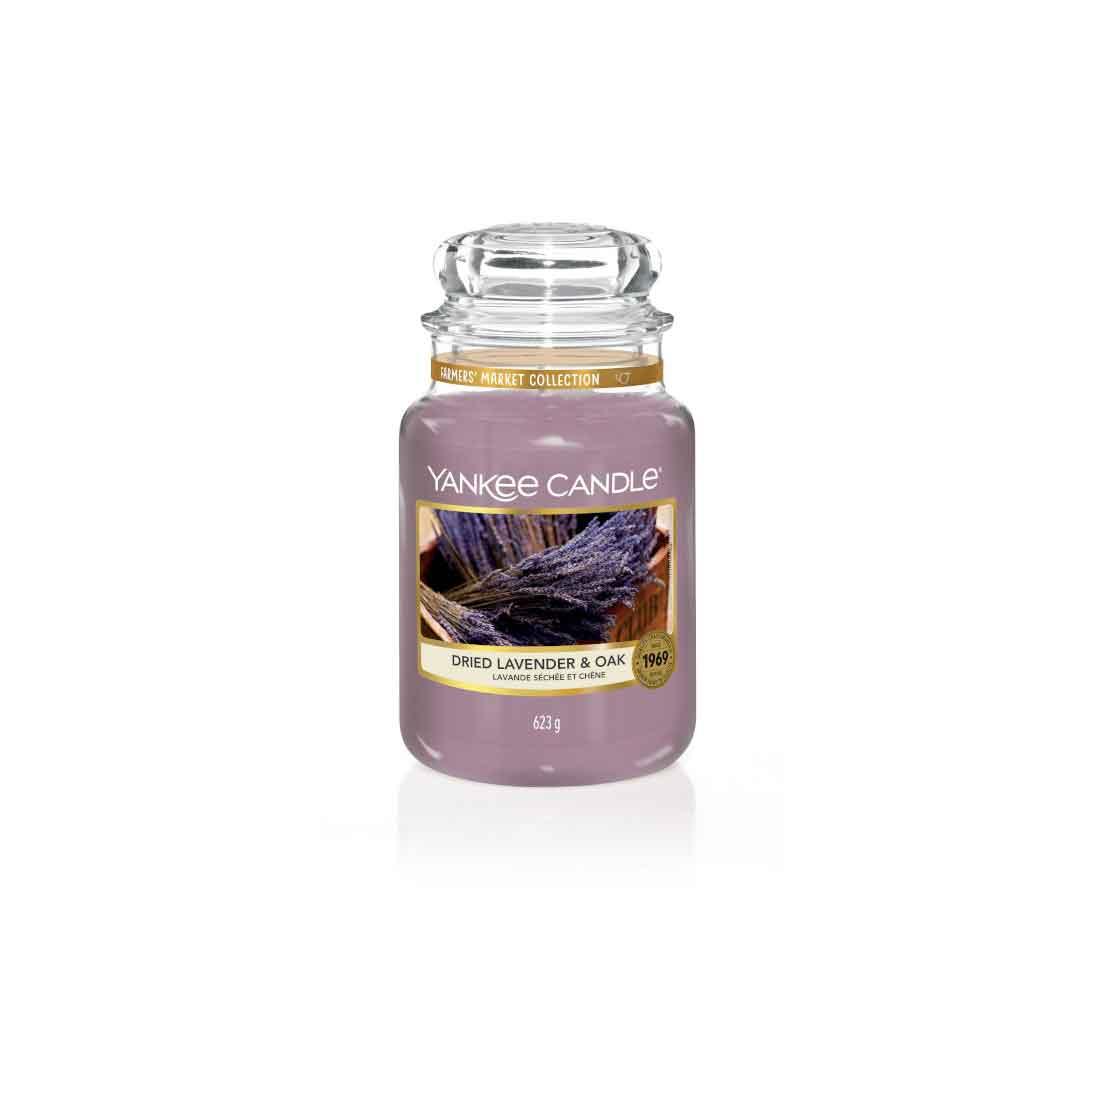 Yankee Candle Dried Lavender & Oak Giara Grande